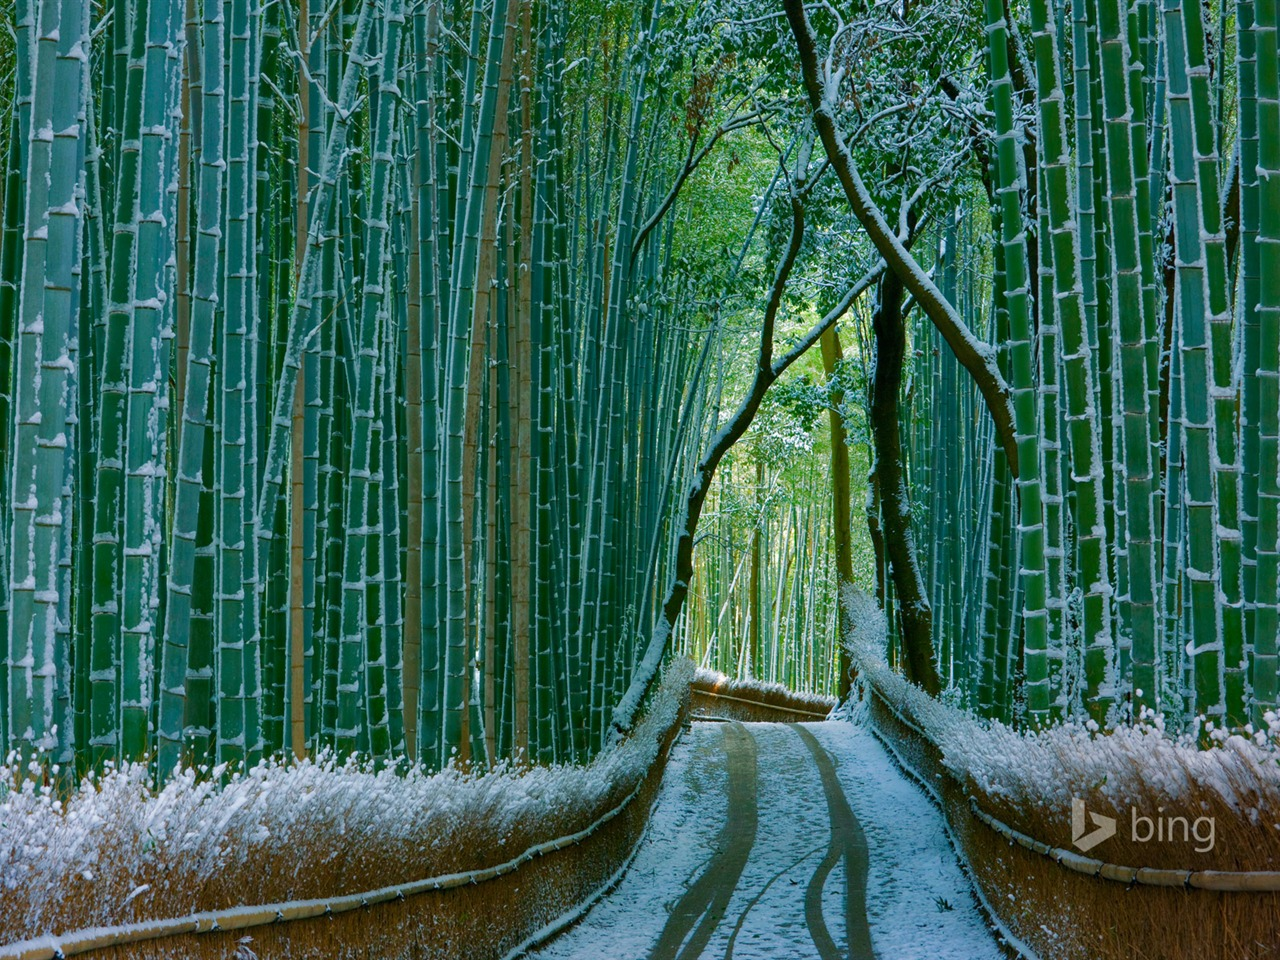 Japan Bamboo Forest Arashiyama 2016 Bing Desktop Wallpaper